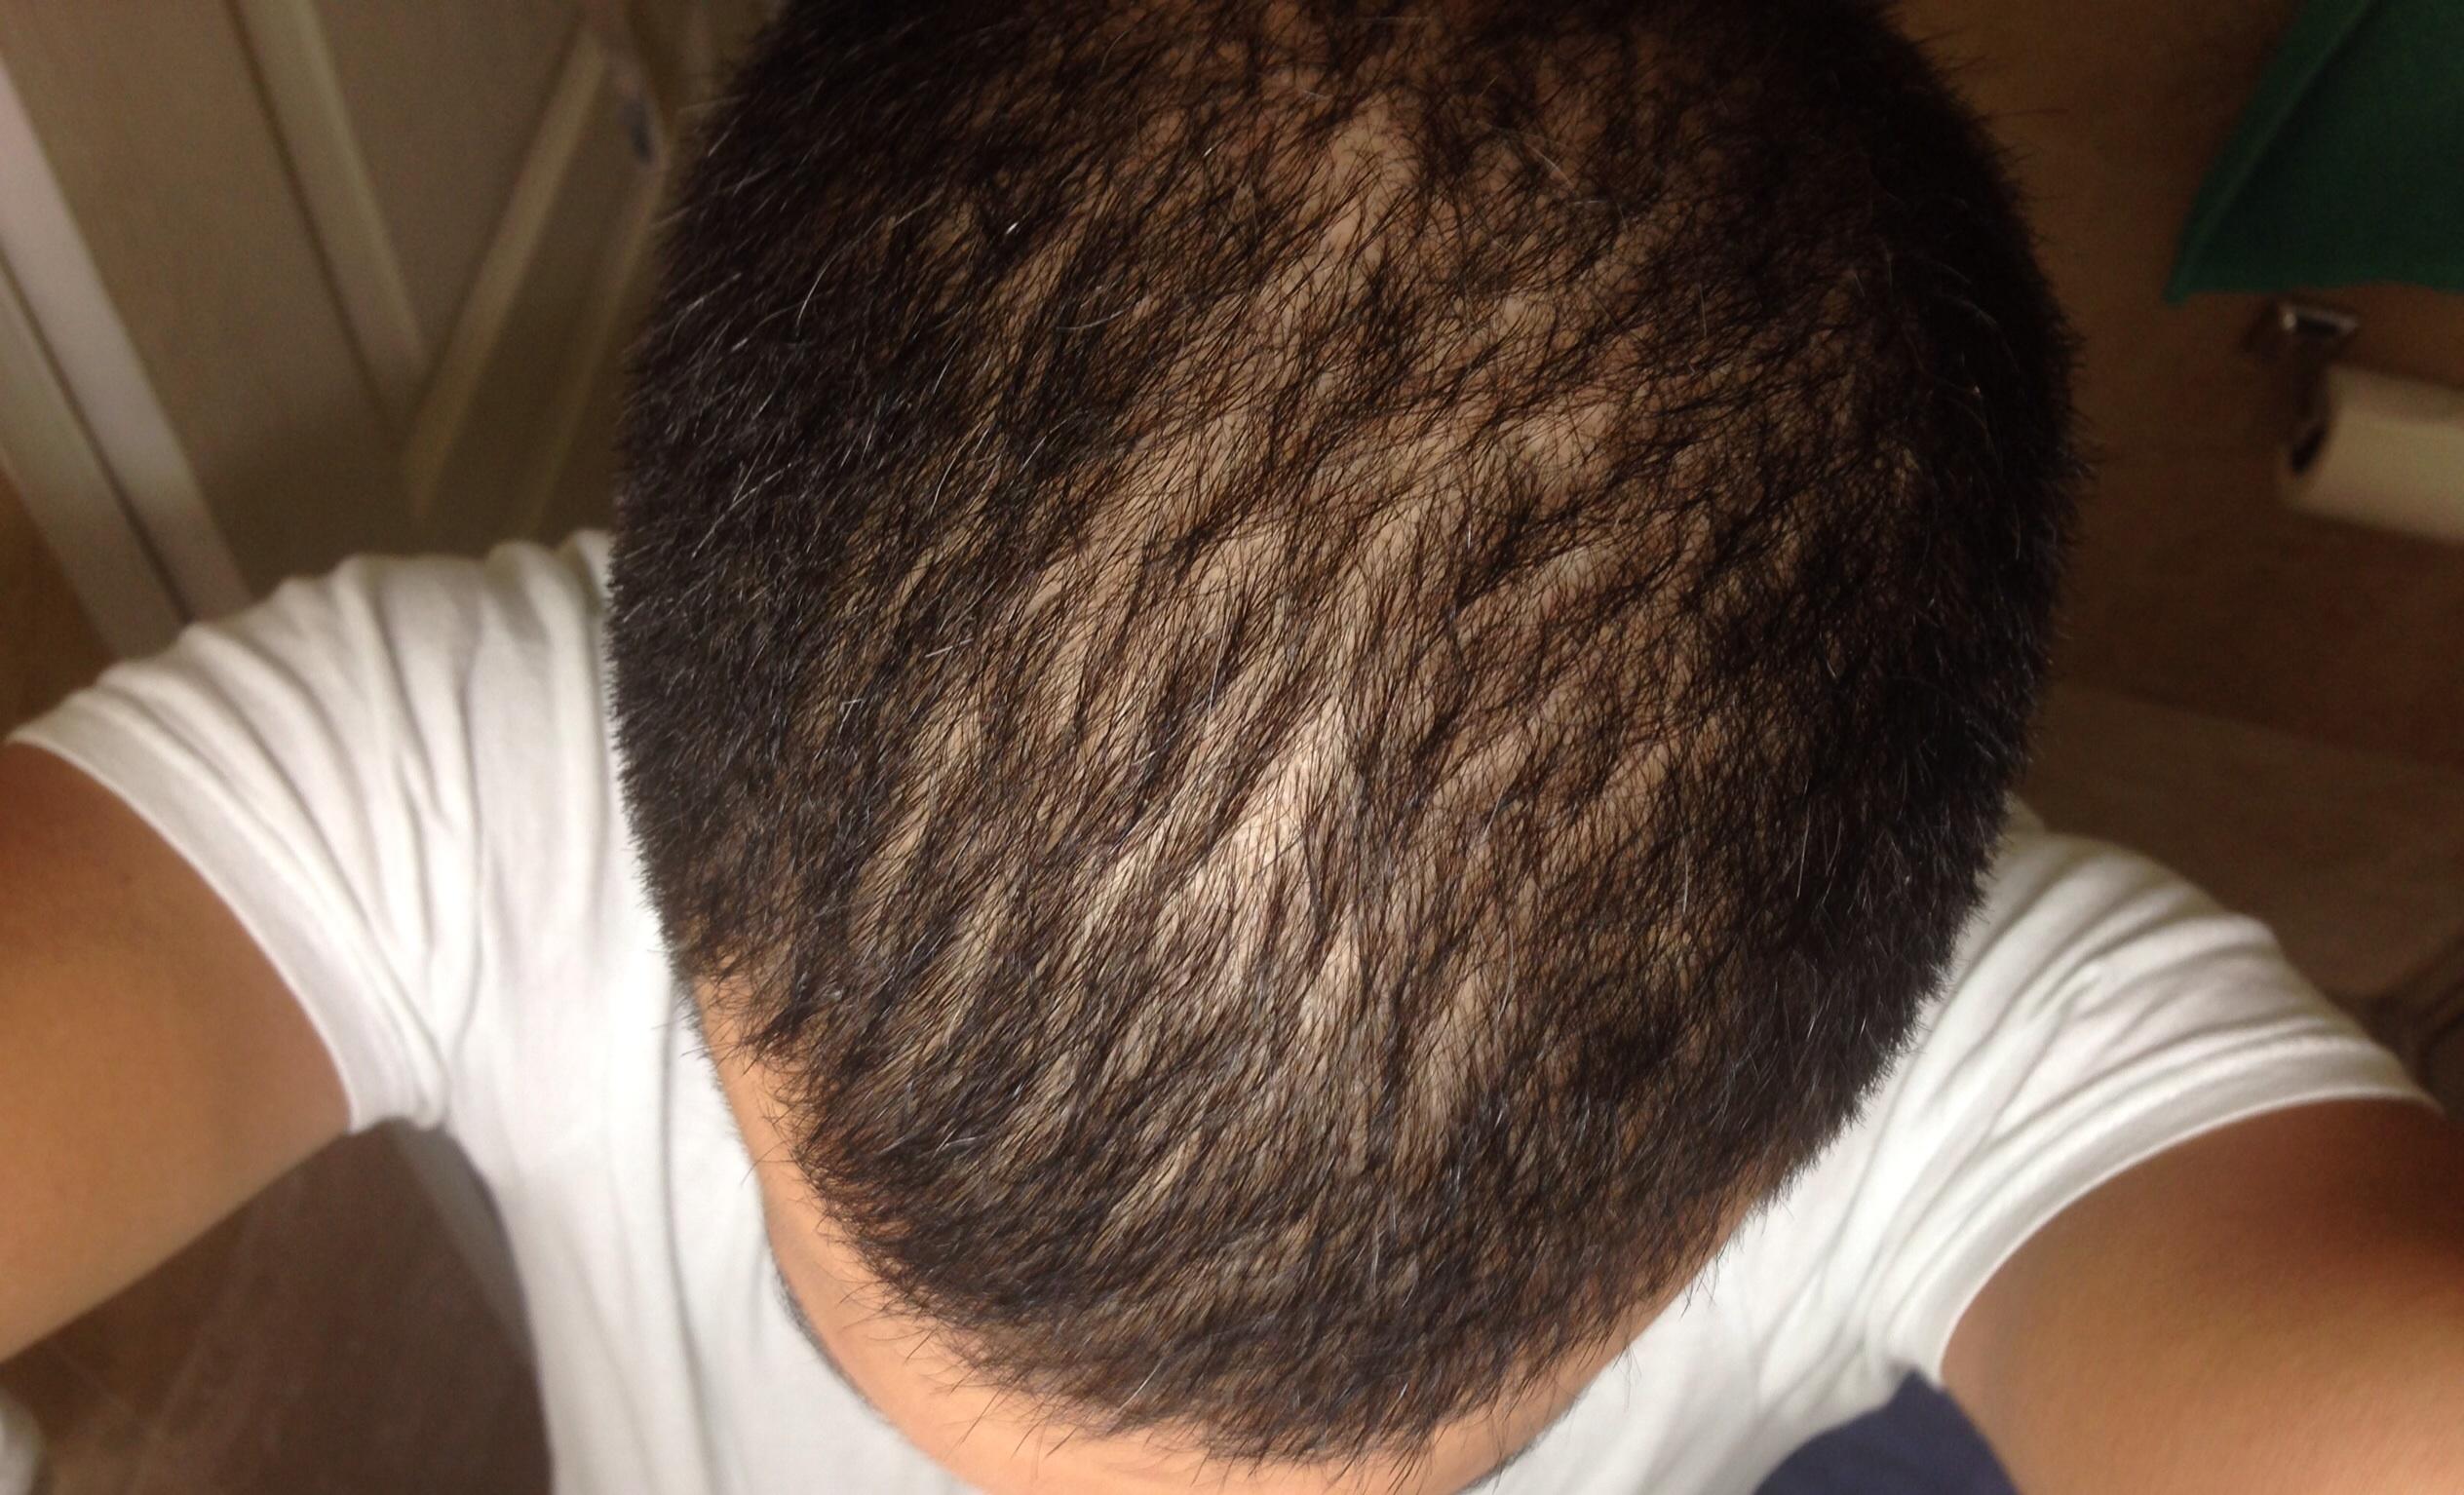 langfrister schaden von nassem haare glà tten haarausfall